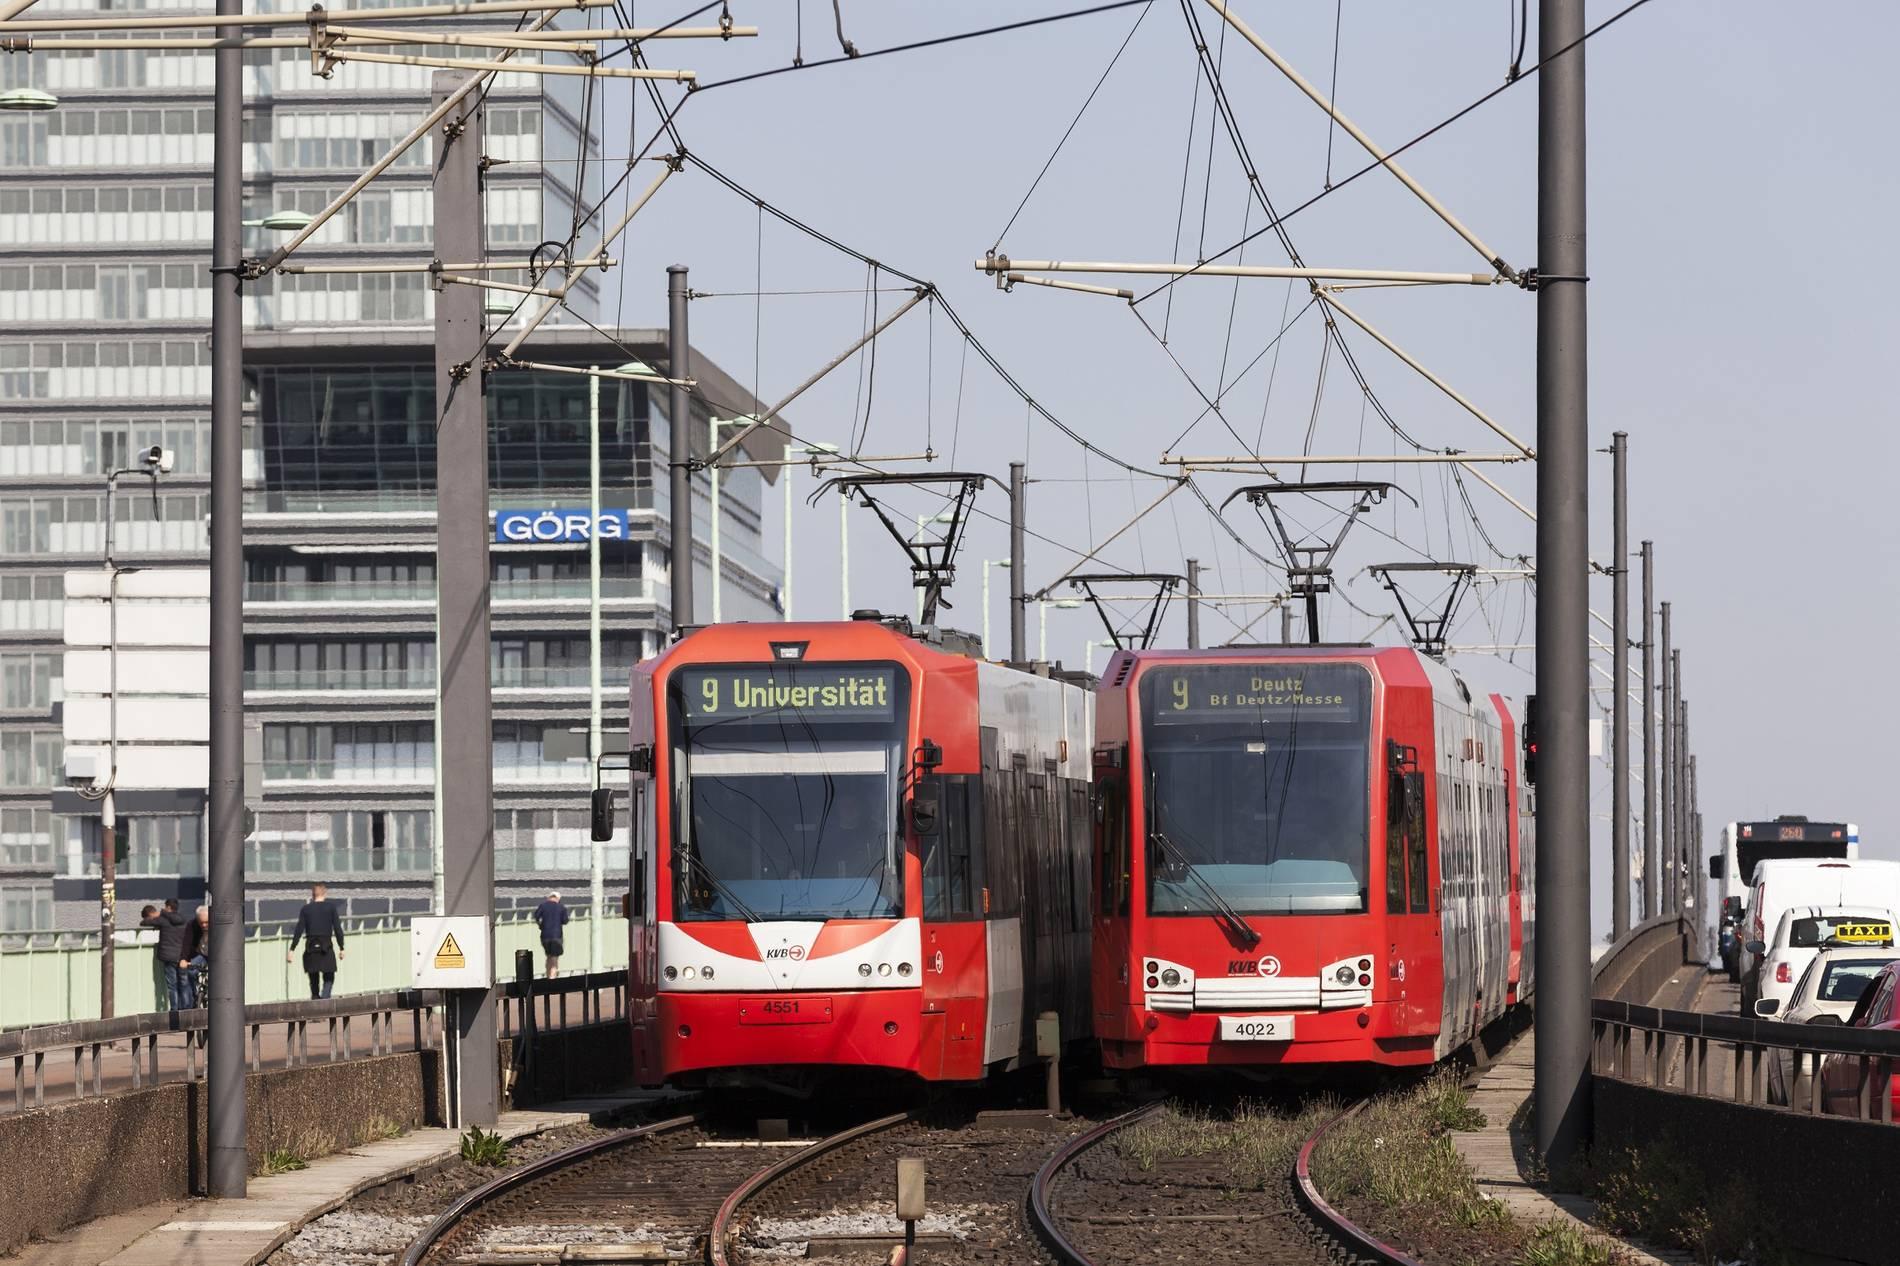 Köln Kvb Streik Legt Köln Am Mittwoch Lahm Asta Richtet